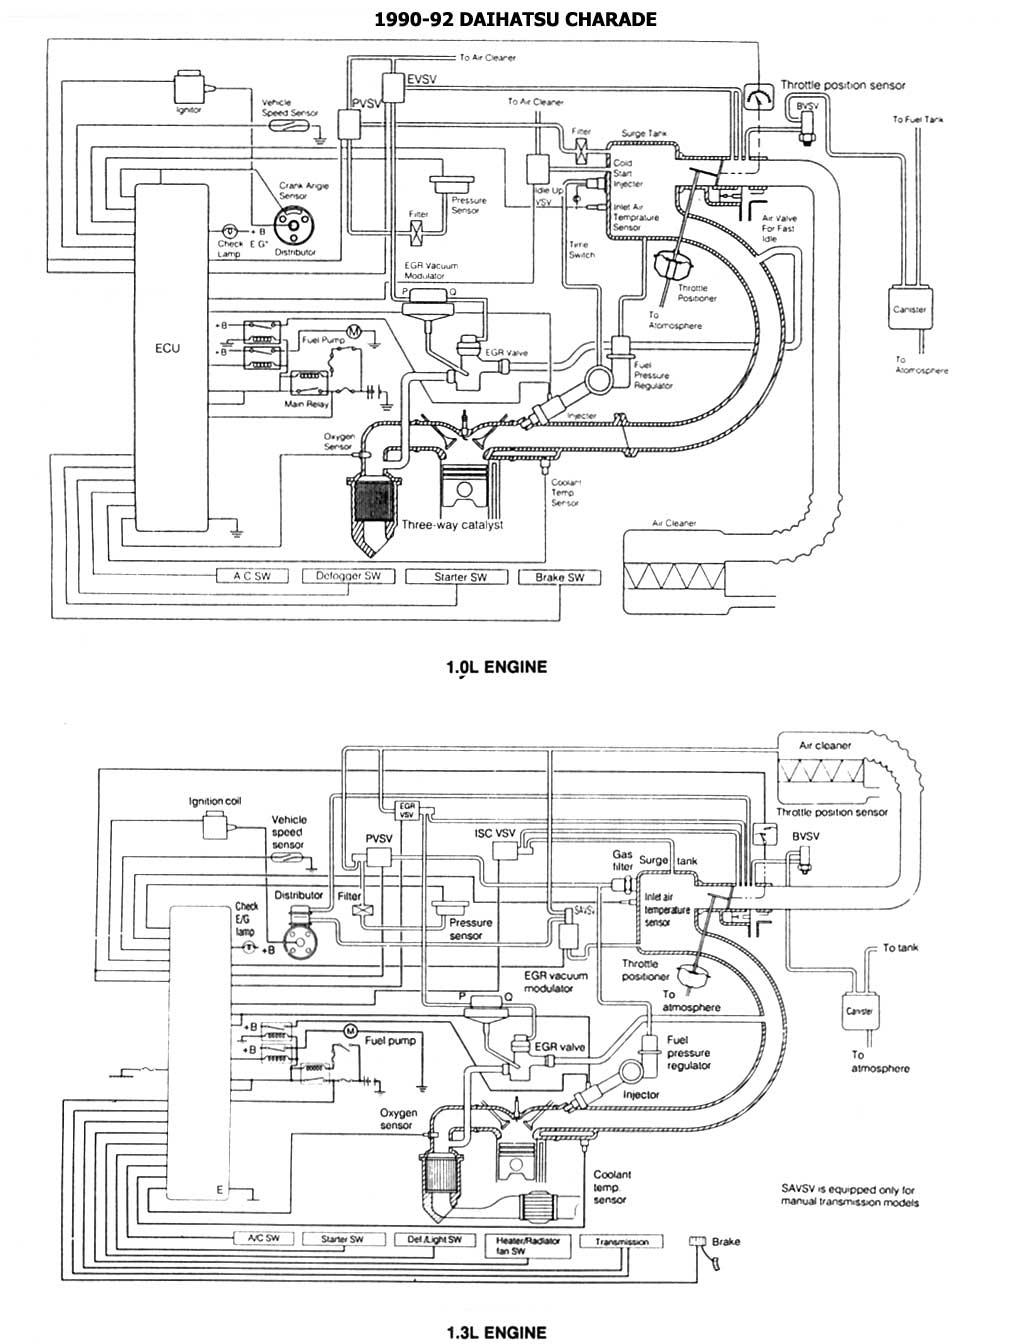 Kia Pride Engine Diagram Application Wiring Daihatsu Diagrams Charade G20 U2022 Rh Msblog Co 2008 Rio